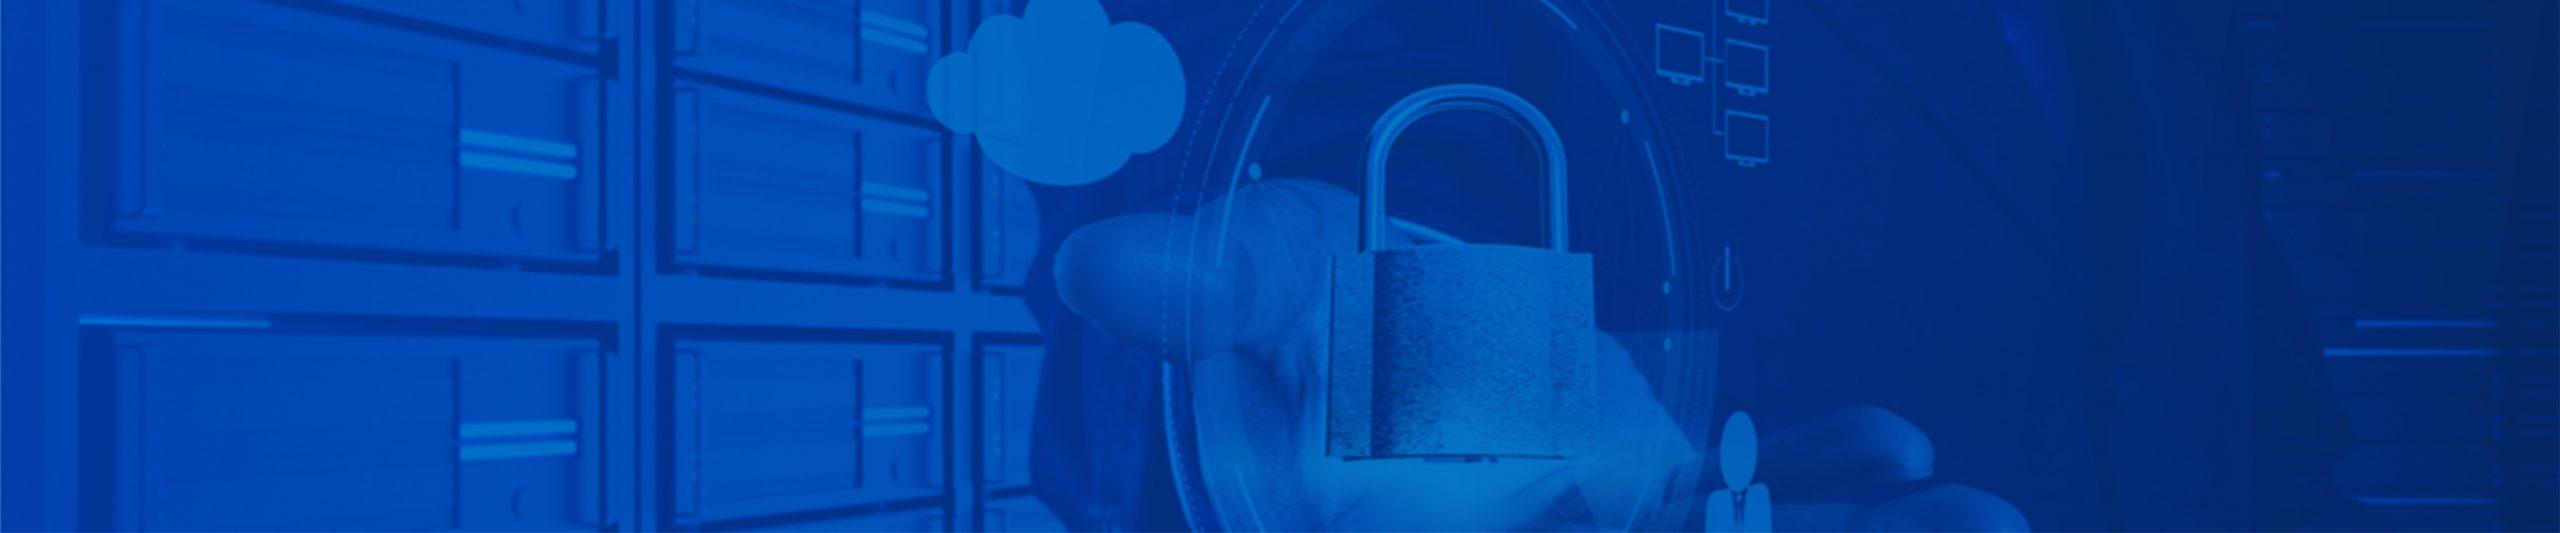 SMS Firewall & Monetization Header image